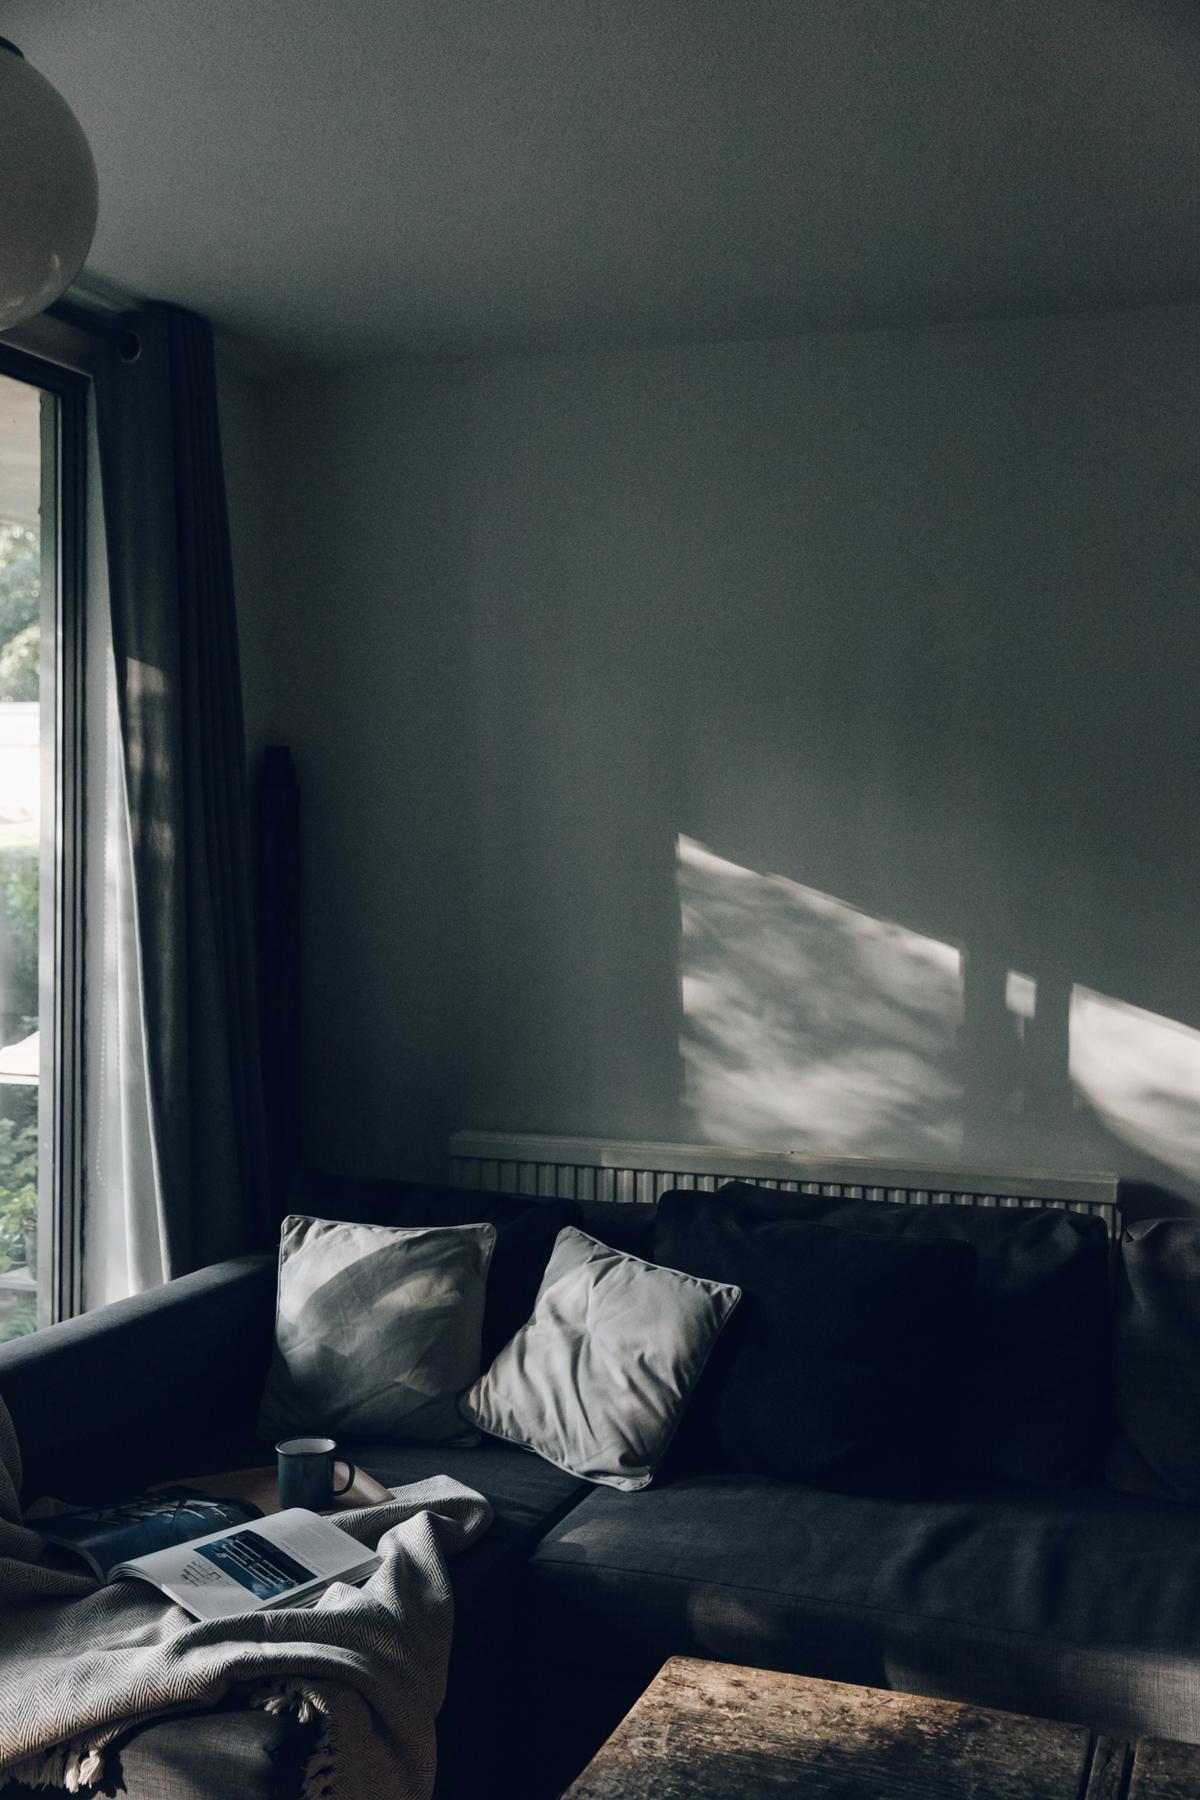 A cozy Sunday morning.